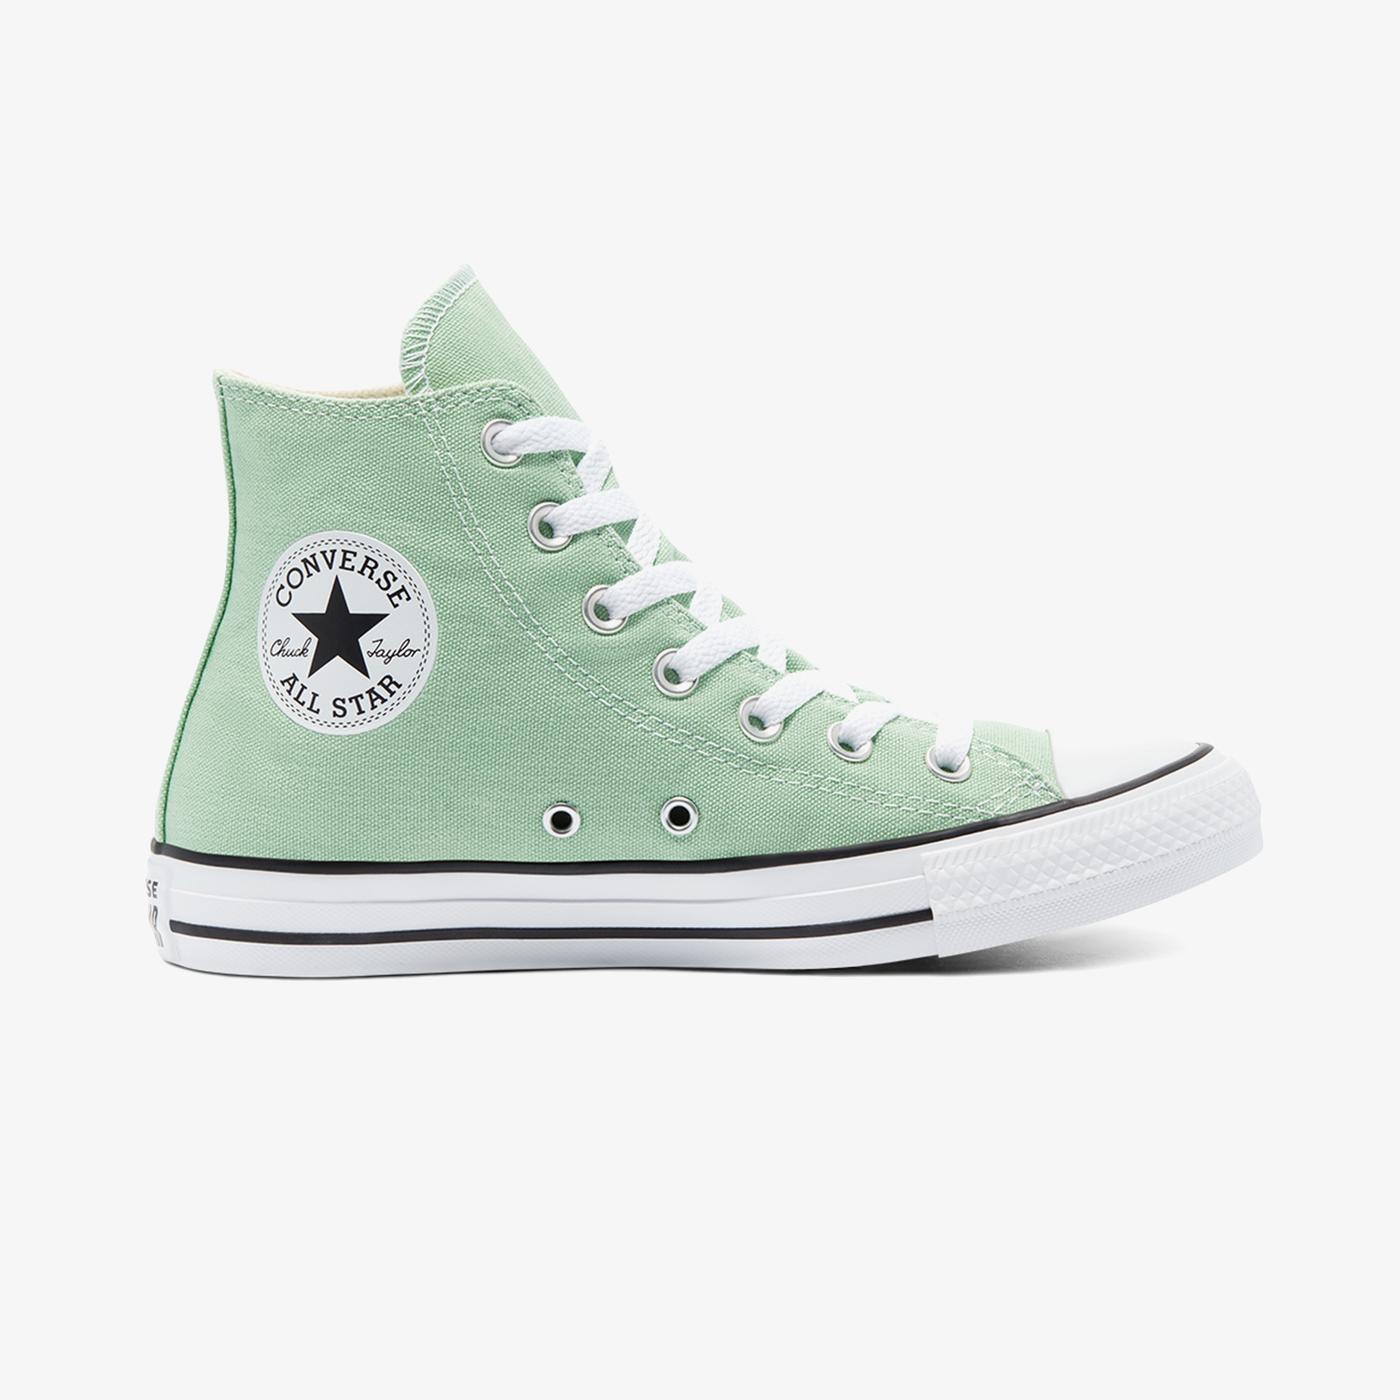 Converse Chuck Taylor All Star Seasonal Color Hi Kadın Yeşil Sneaker